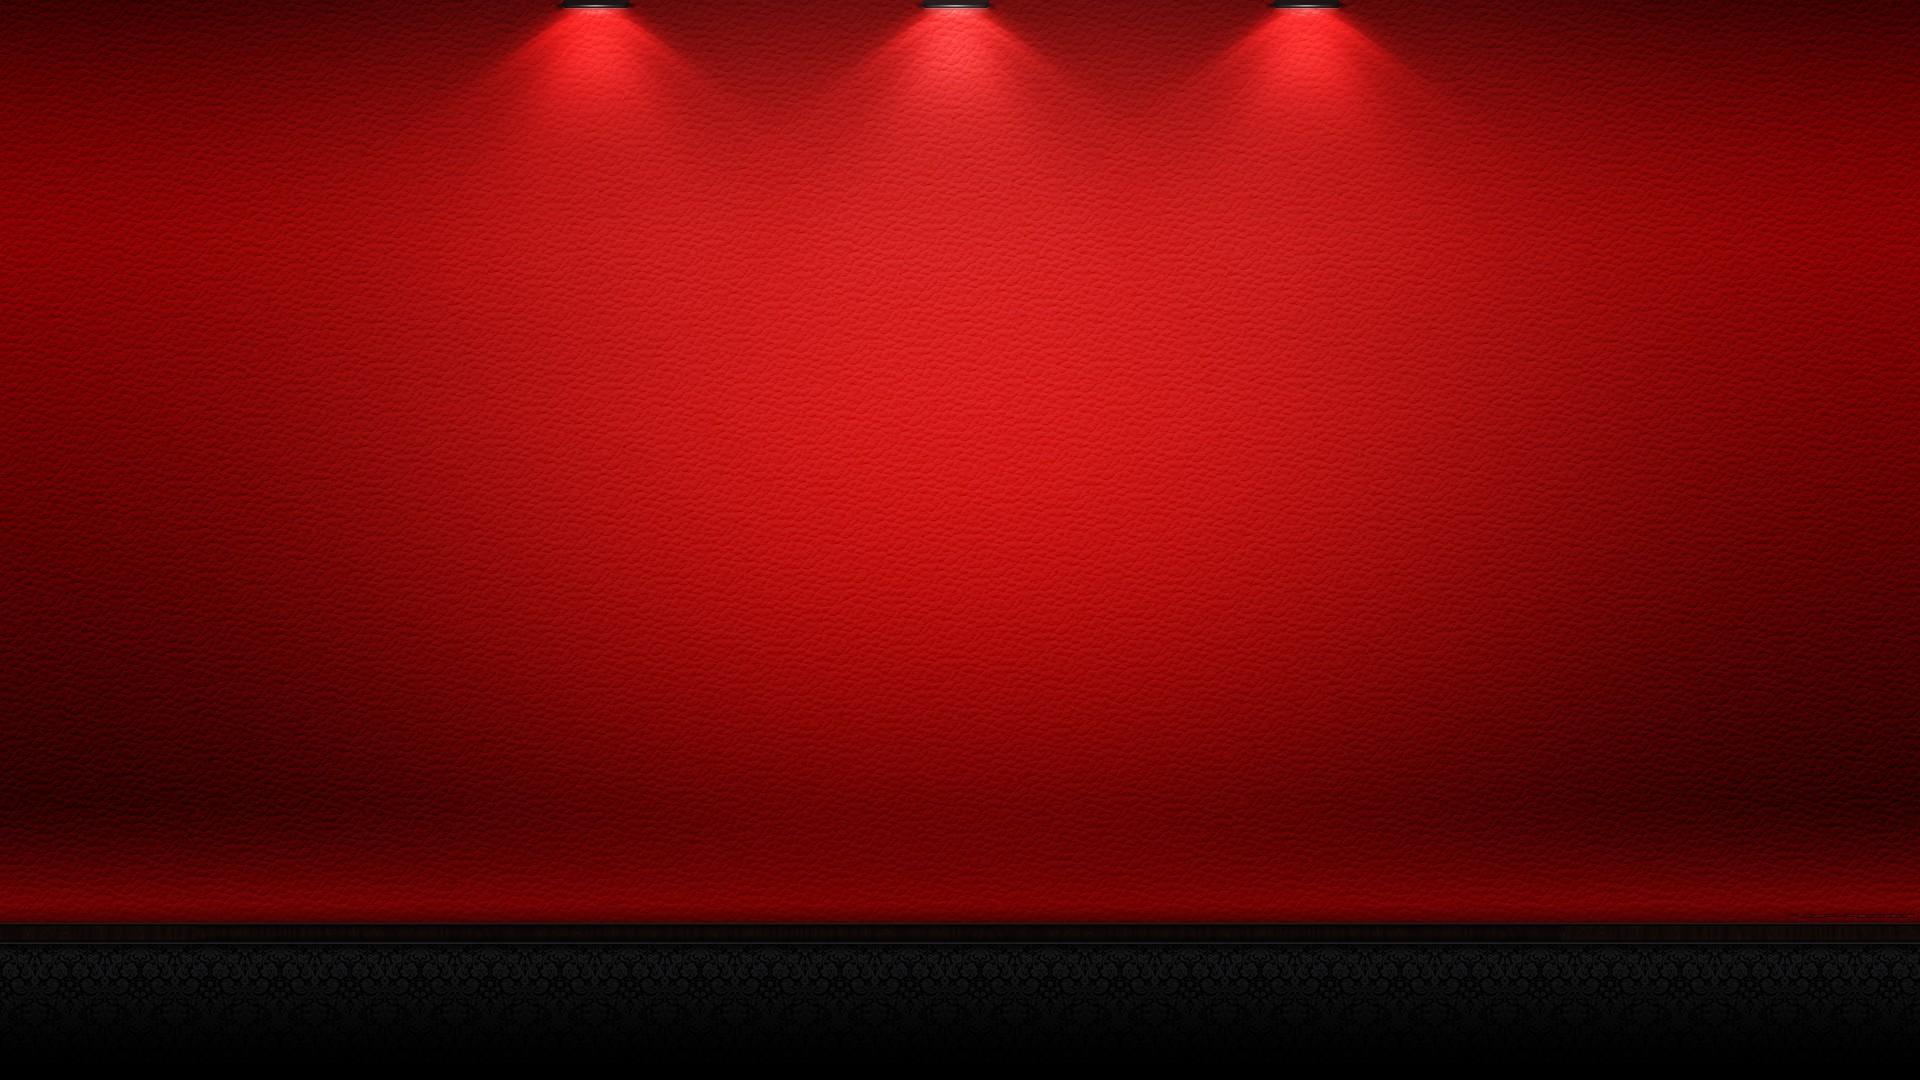 Black Wallpaper Iphone 7 Plus Red Wallpapers Hd